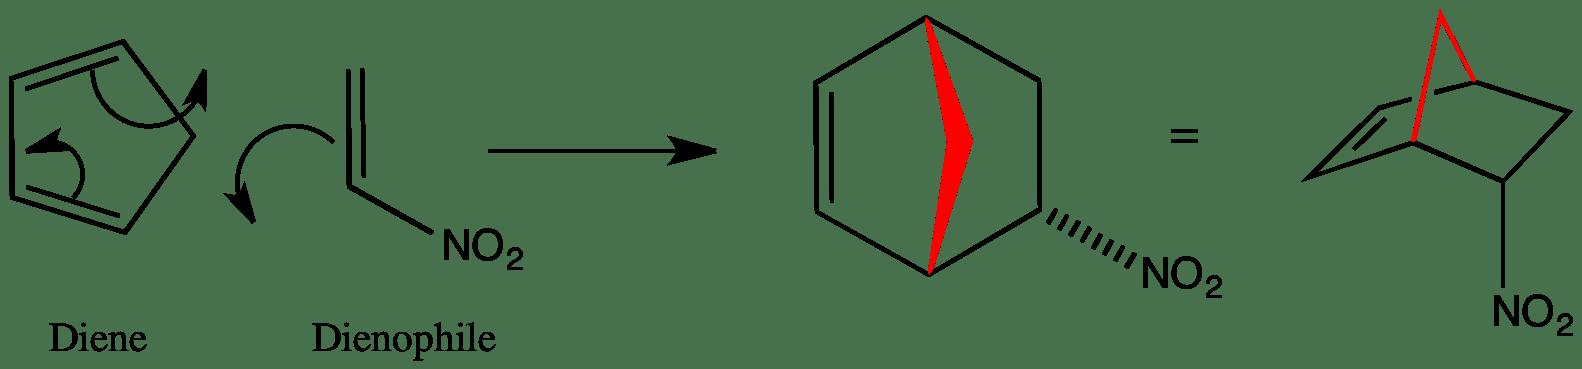 Sn2  1,3 Cyclopentadiene